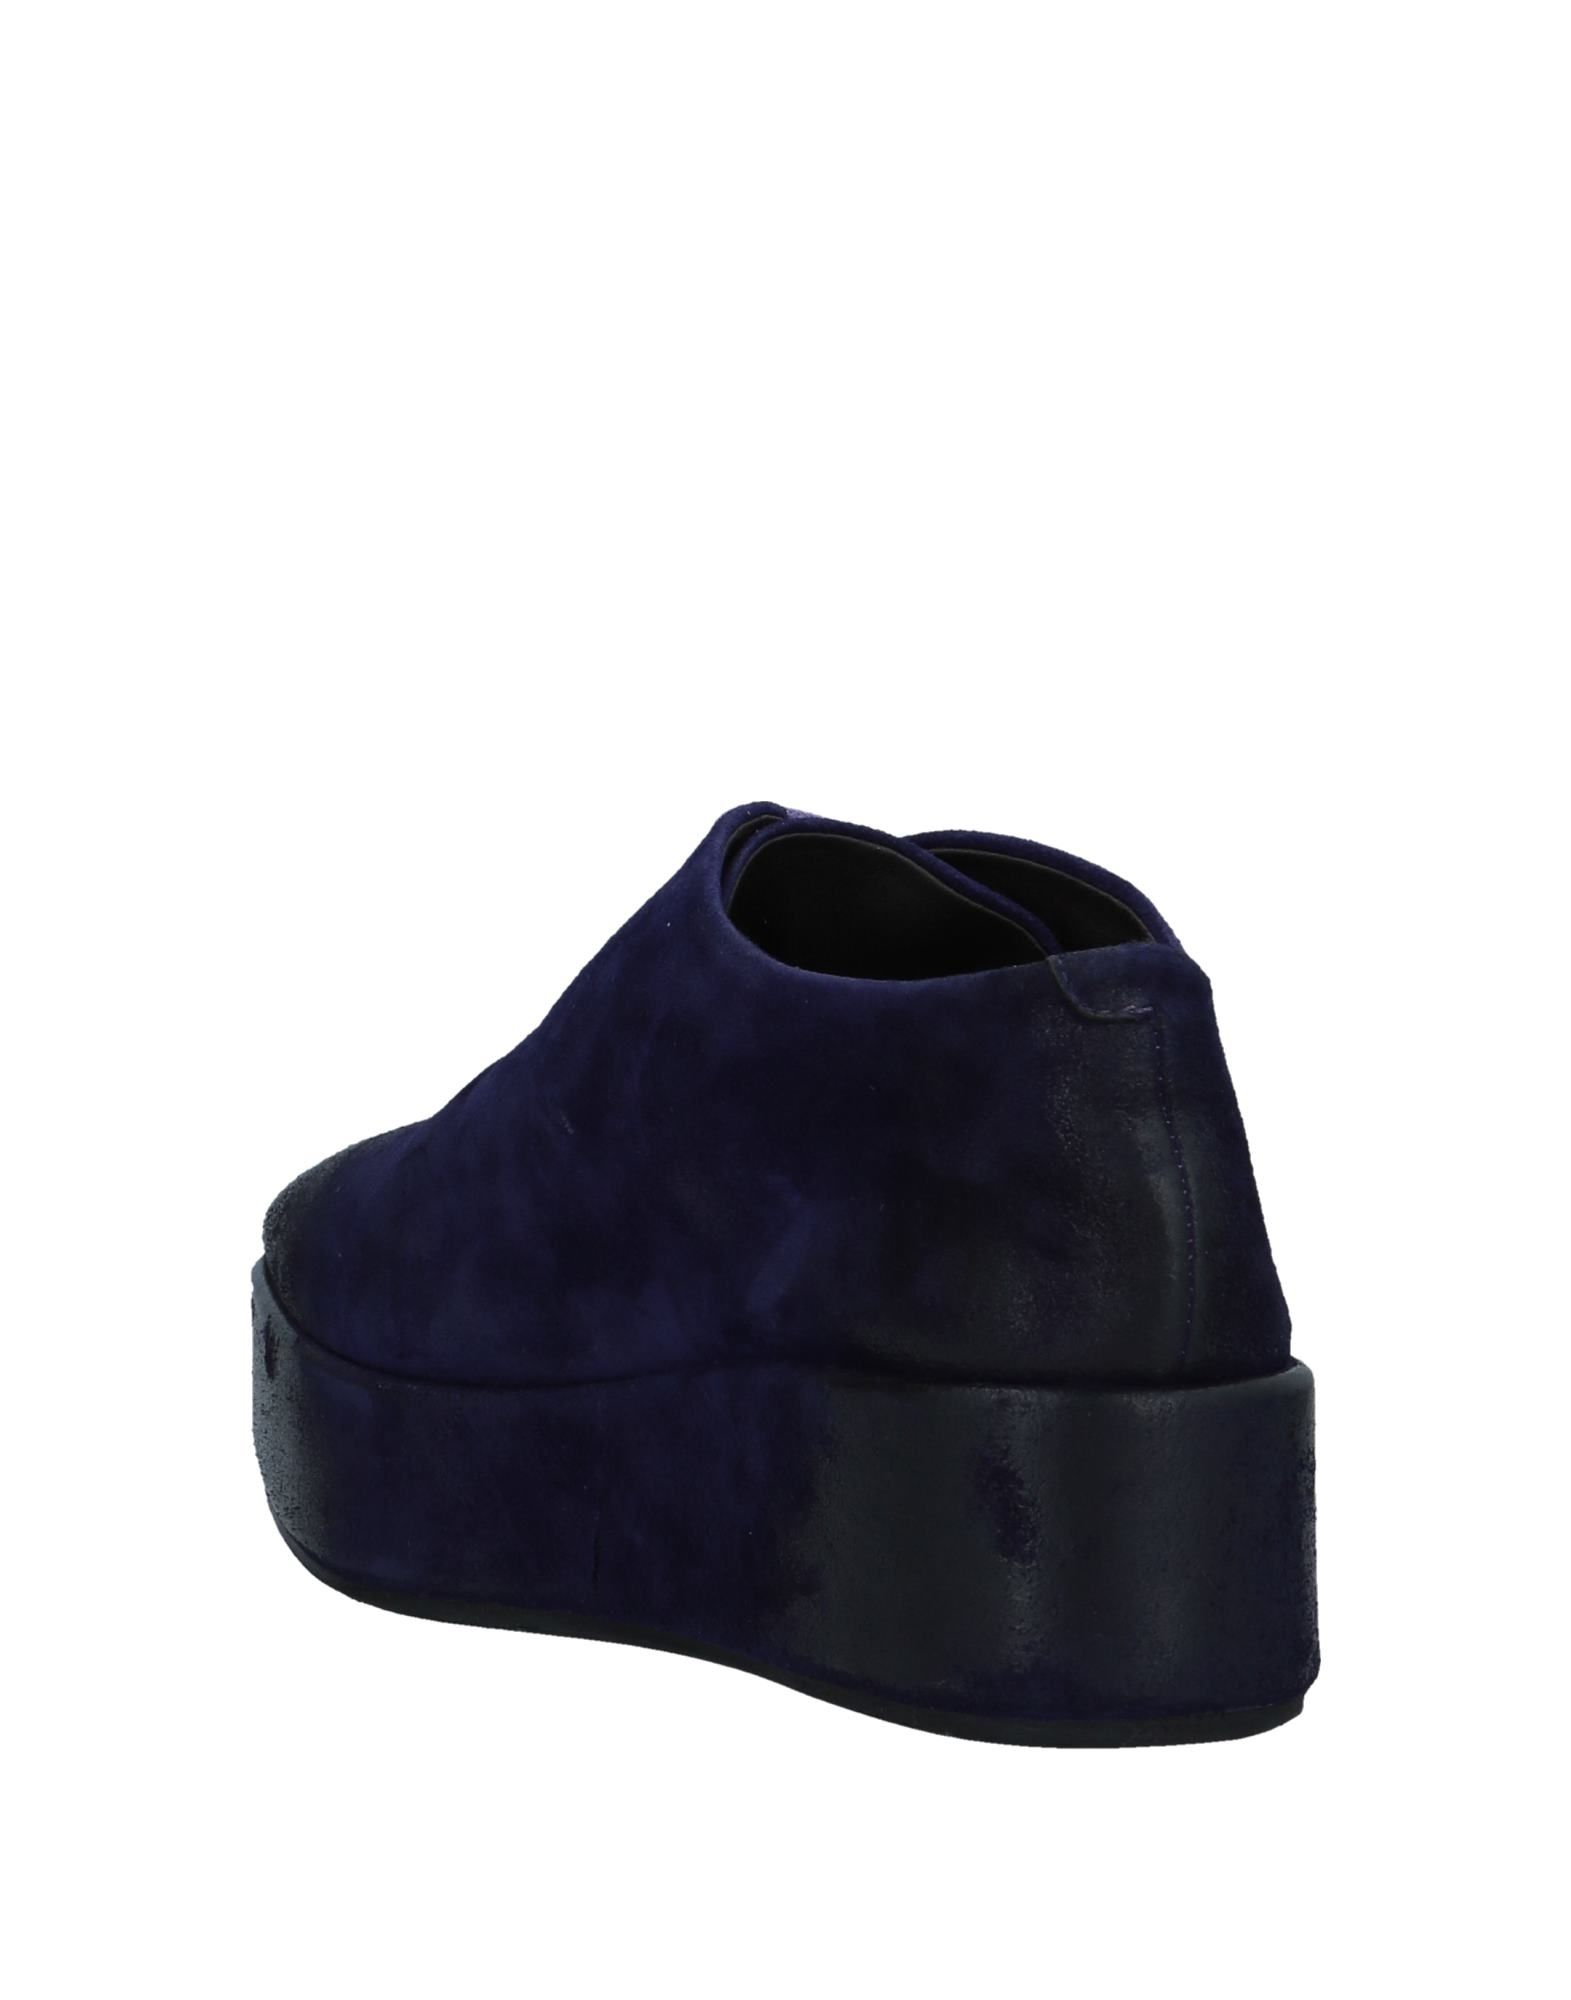 Rabatt Schuhe Schuhe Rabatt Marsèll Schnürschuhe Damen 11527254TG 7081ed